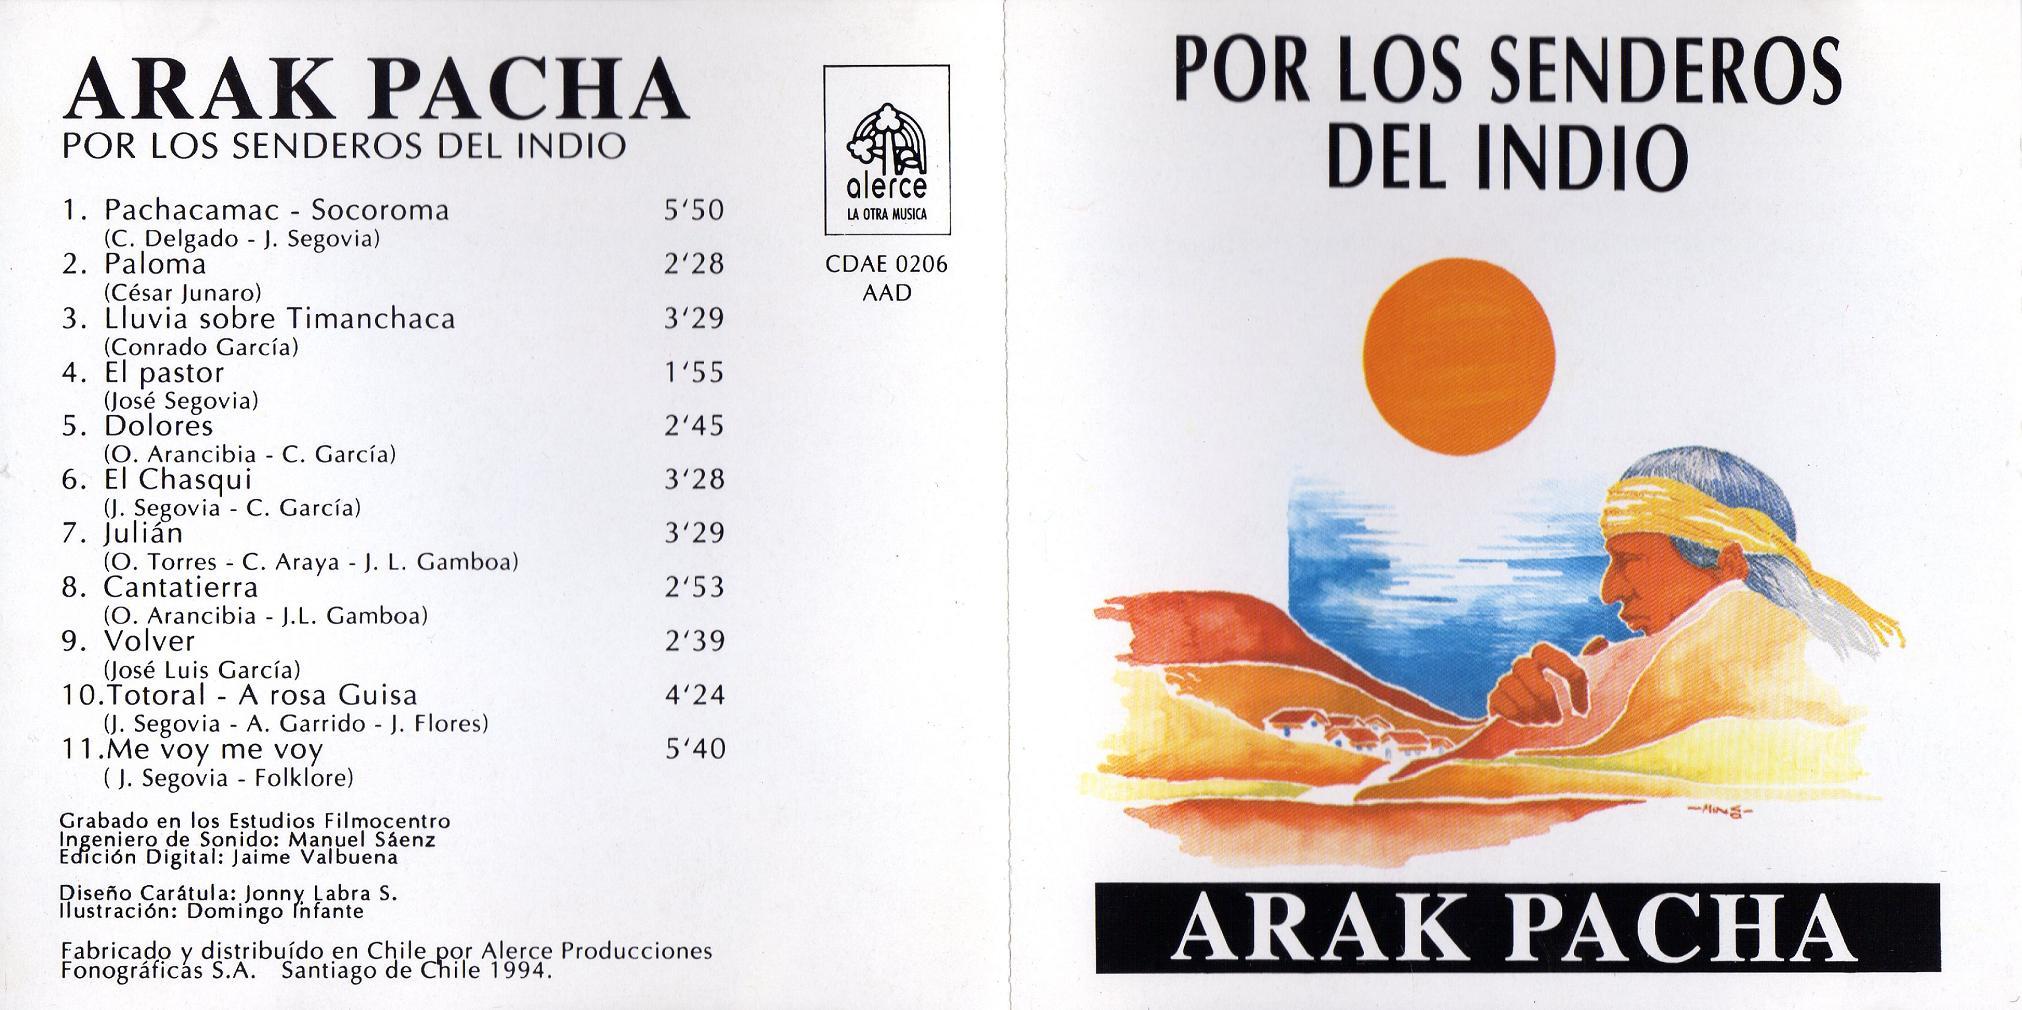 discografia de arak pacha gratis